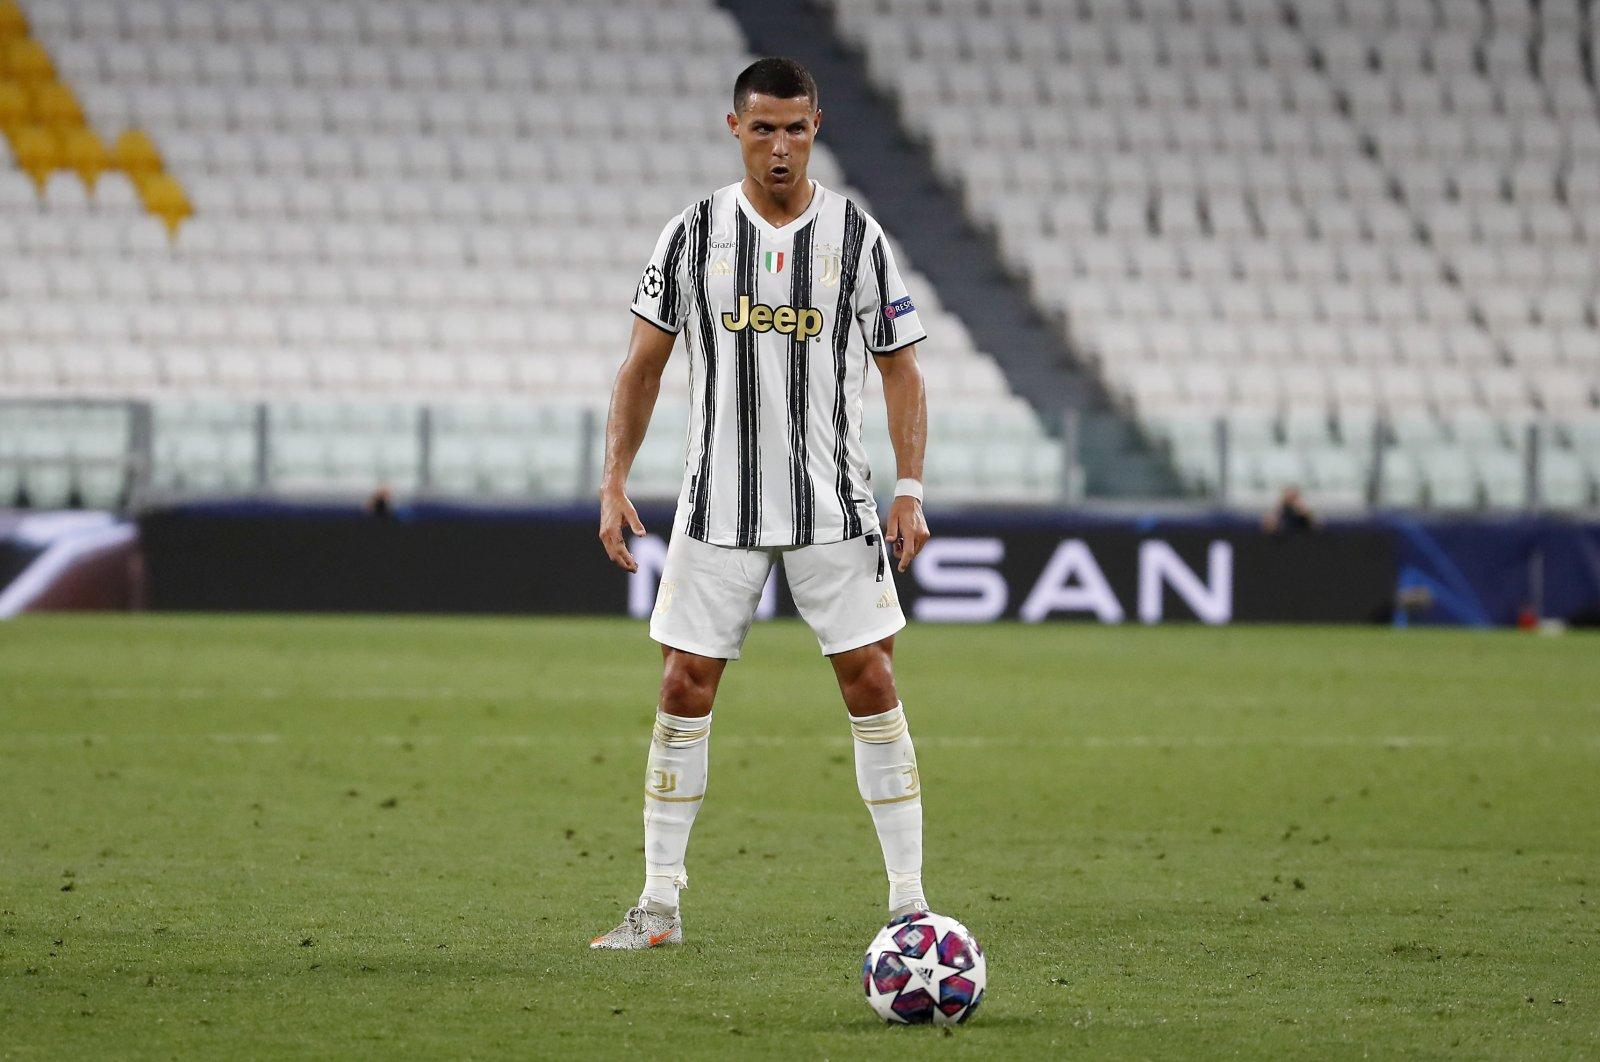 Juventus' Cristiano Ronaldo prepares to take a free kick during a Champions match against Lyon, in Turin, Italy, Aug. 7, 2020. (AP Photo)